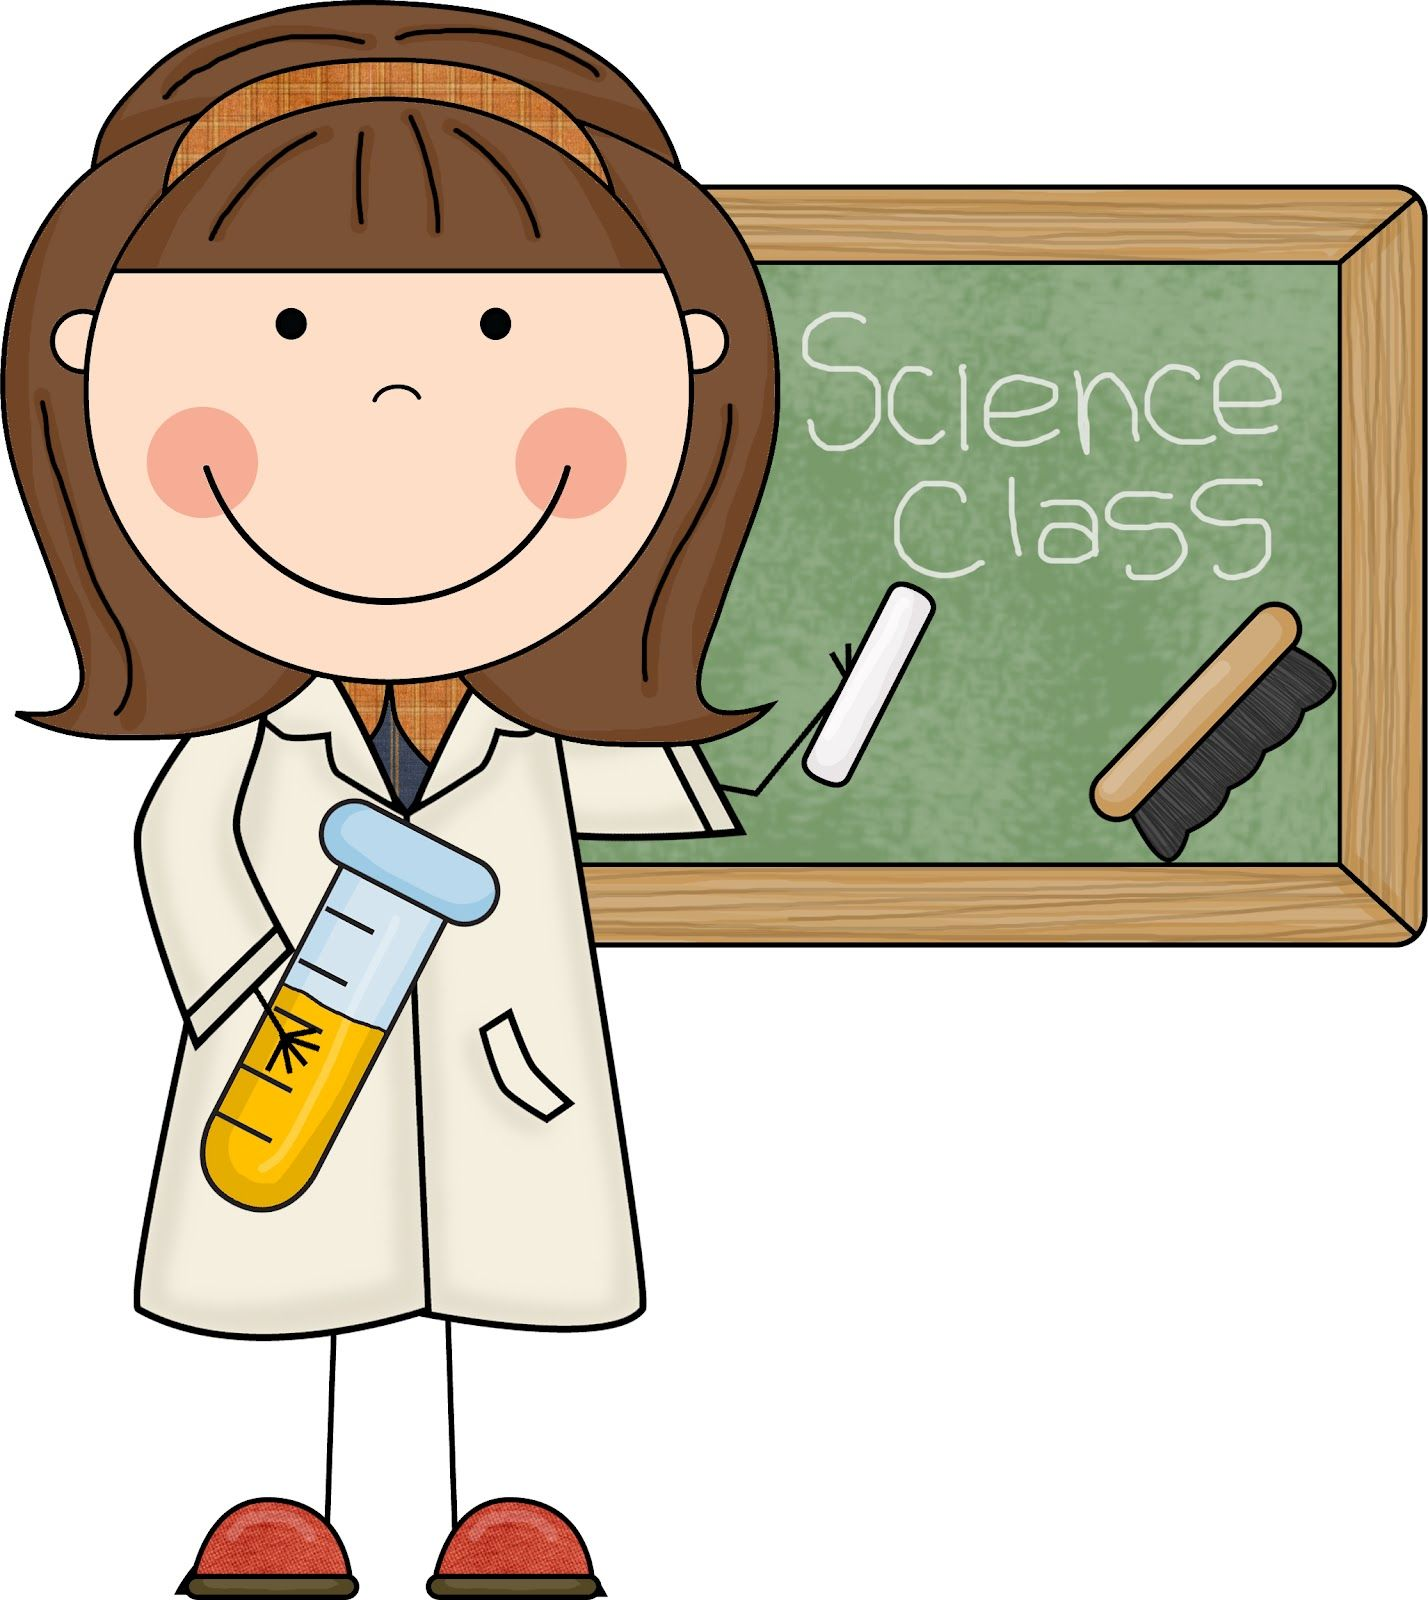 Male Science Teacher Clipart | Clipart Panda - Free Clipart Images